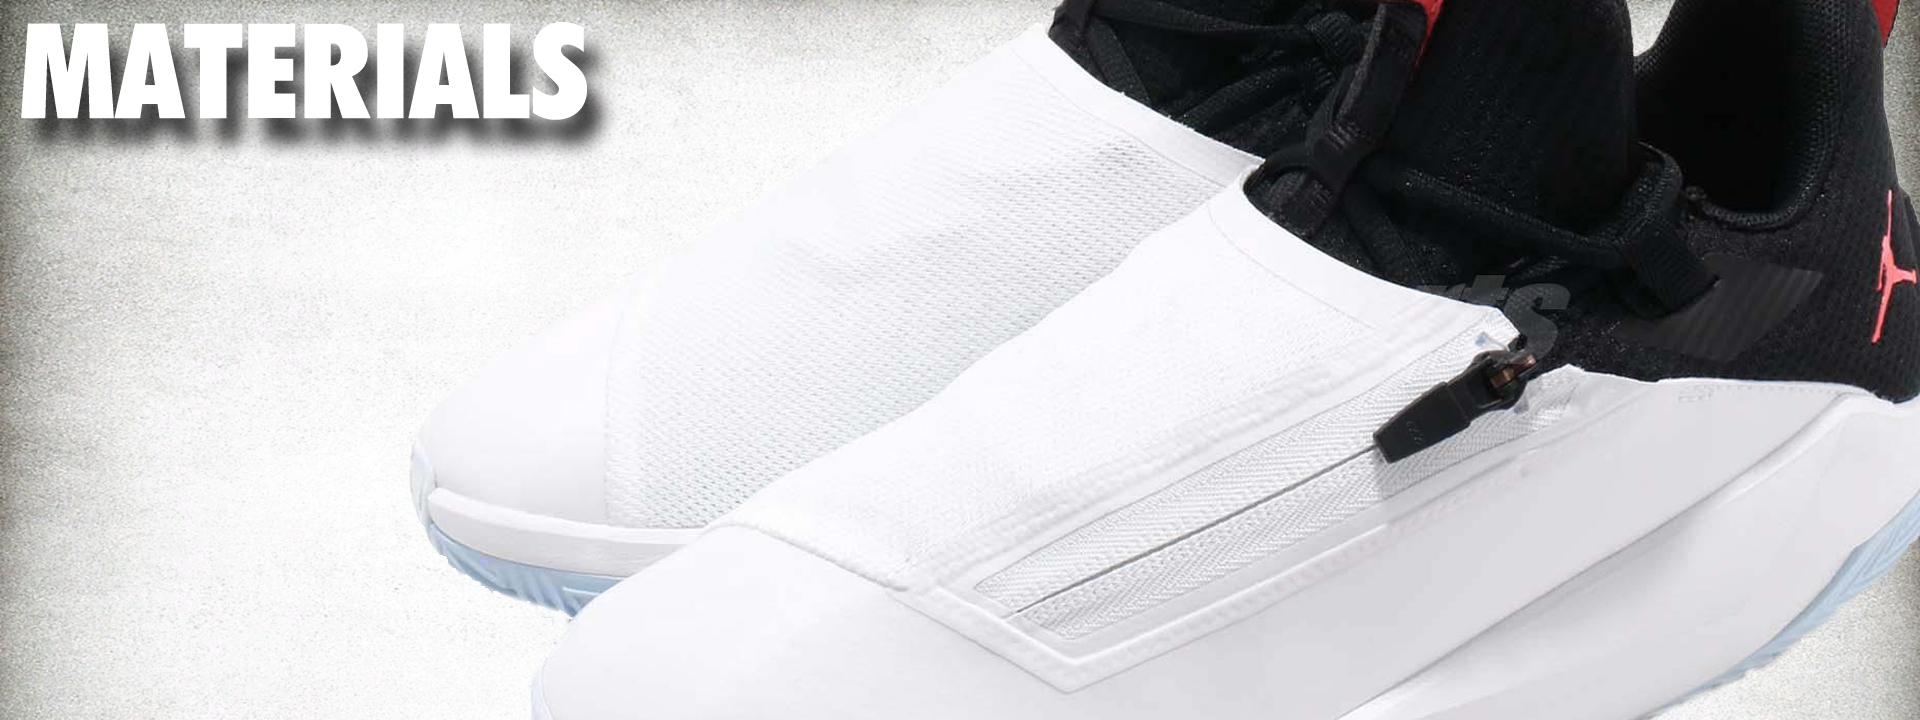 c73ada5f94b Jordan-Jumpman-Hustle-PF-Performance-Review-Materials - WearTesters